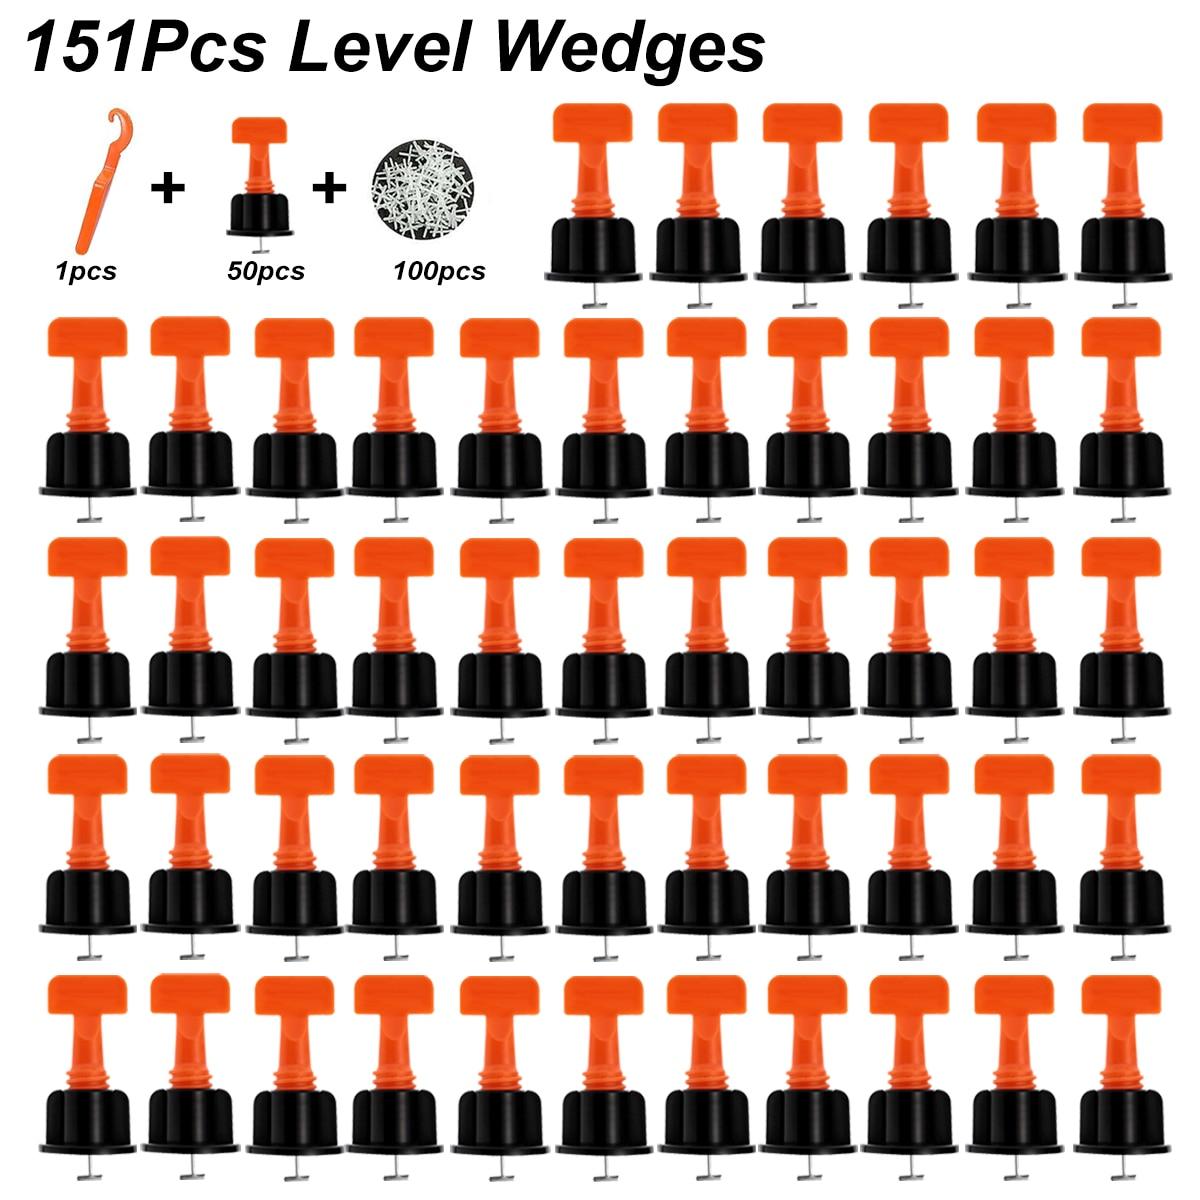 151Pcs Level Wedges Tile Spacers For Flooring Wall Tile Spacer Carrelage Tile Leveling System Leveler Locator Spacers Plier